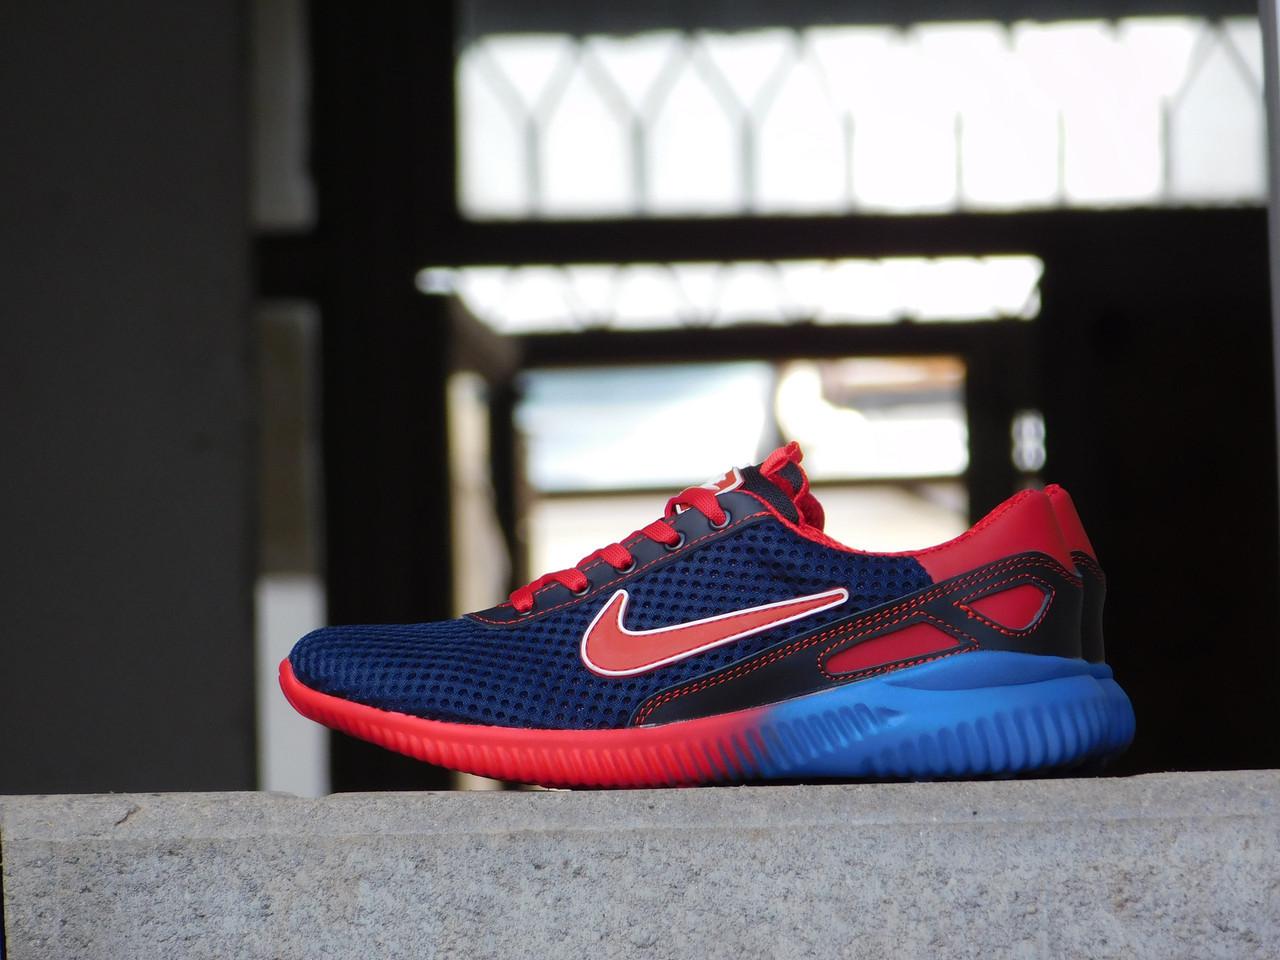 Кроссовки Nike 10113 - Интернет-магазин обуви